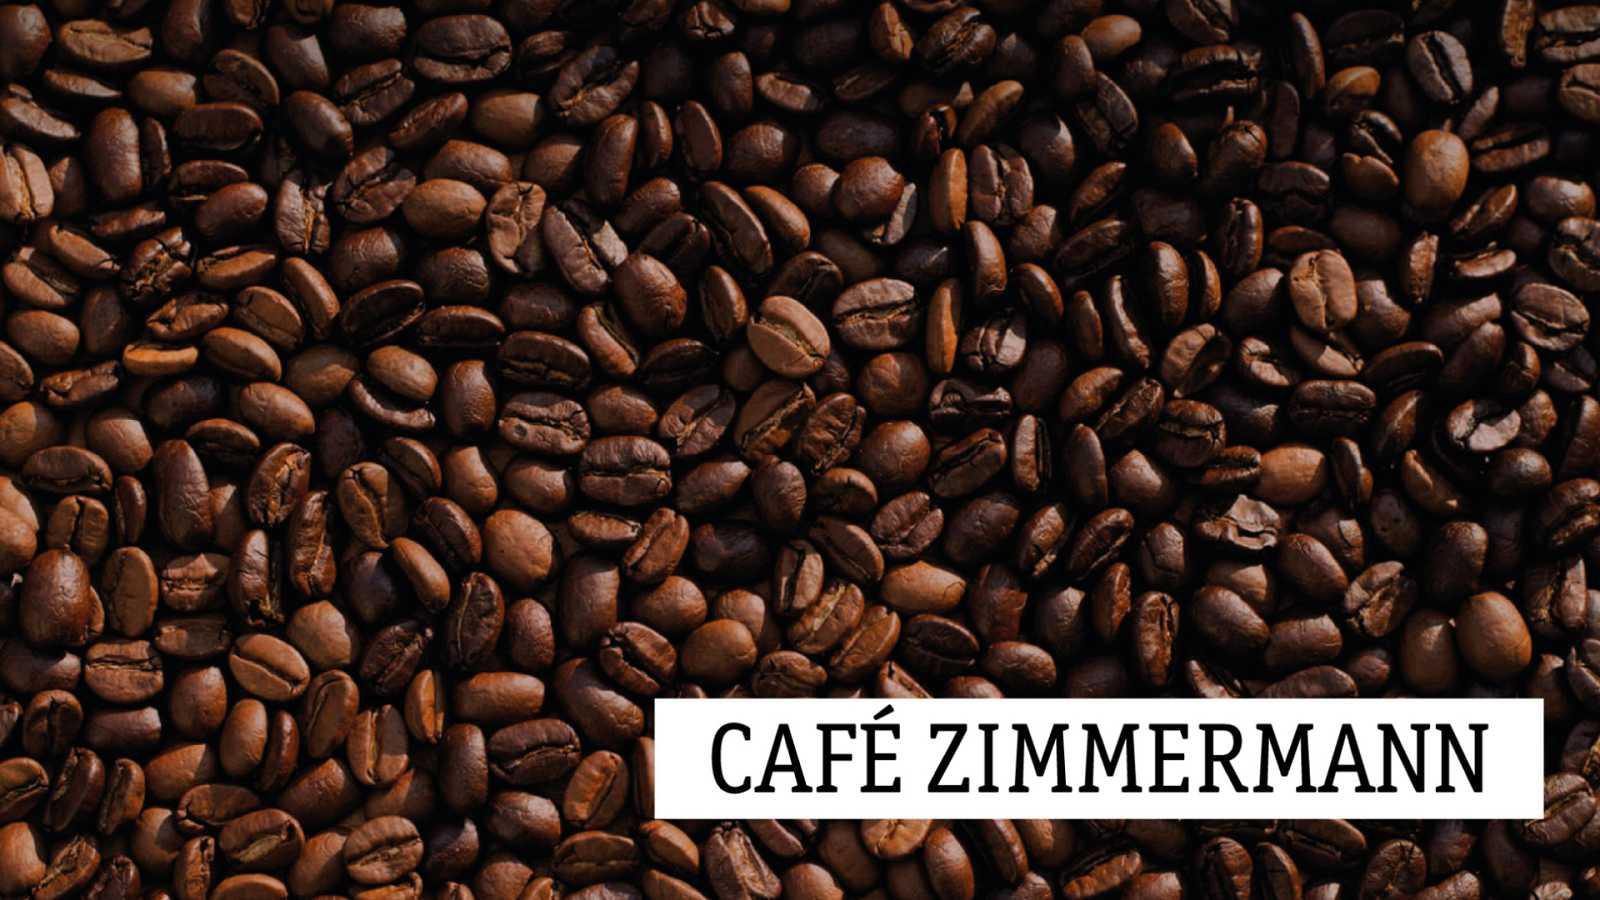 Café Zimmermann - Día Mundial de la Filosofía - 19/11/20 - escuchar ahora